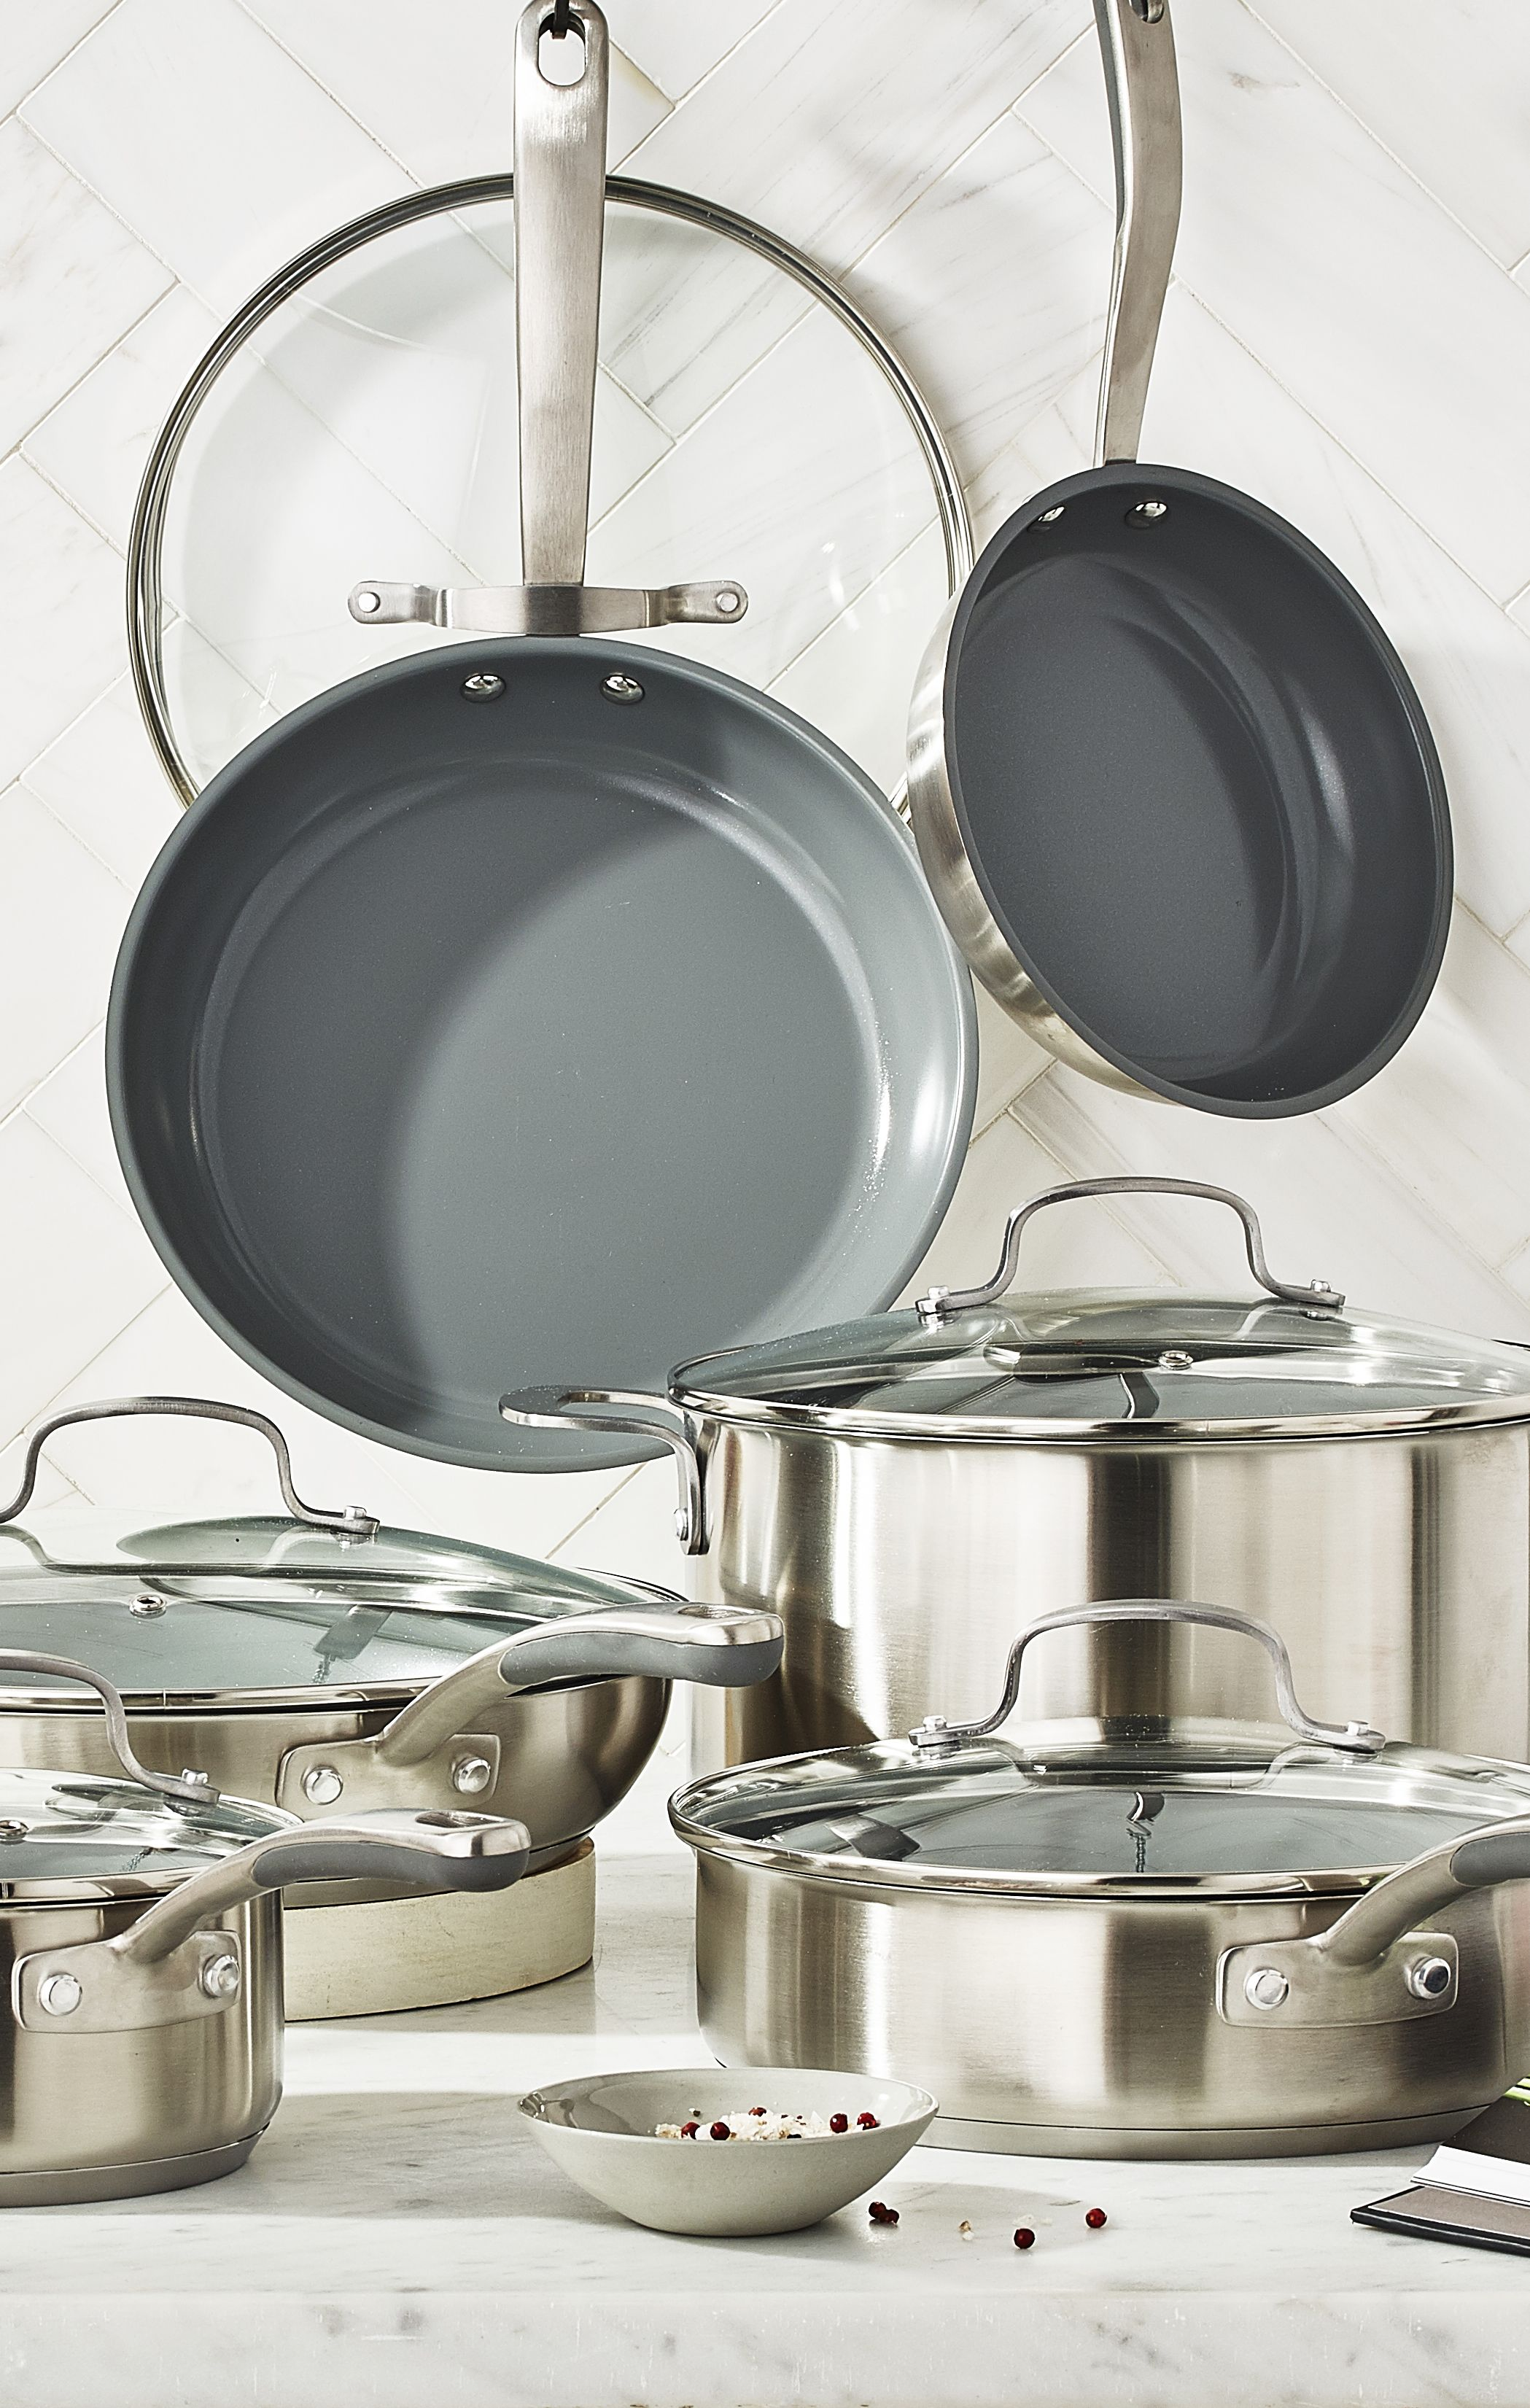 Deals On Kitchen Appliances Bedding Furniture Kitchenware Appliances Christmas Inspiration Ceramic Coating